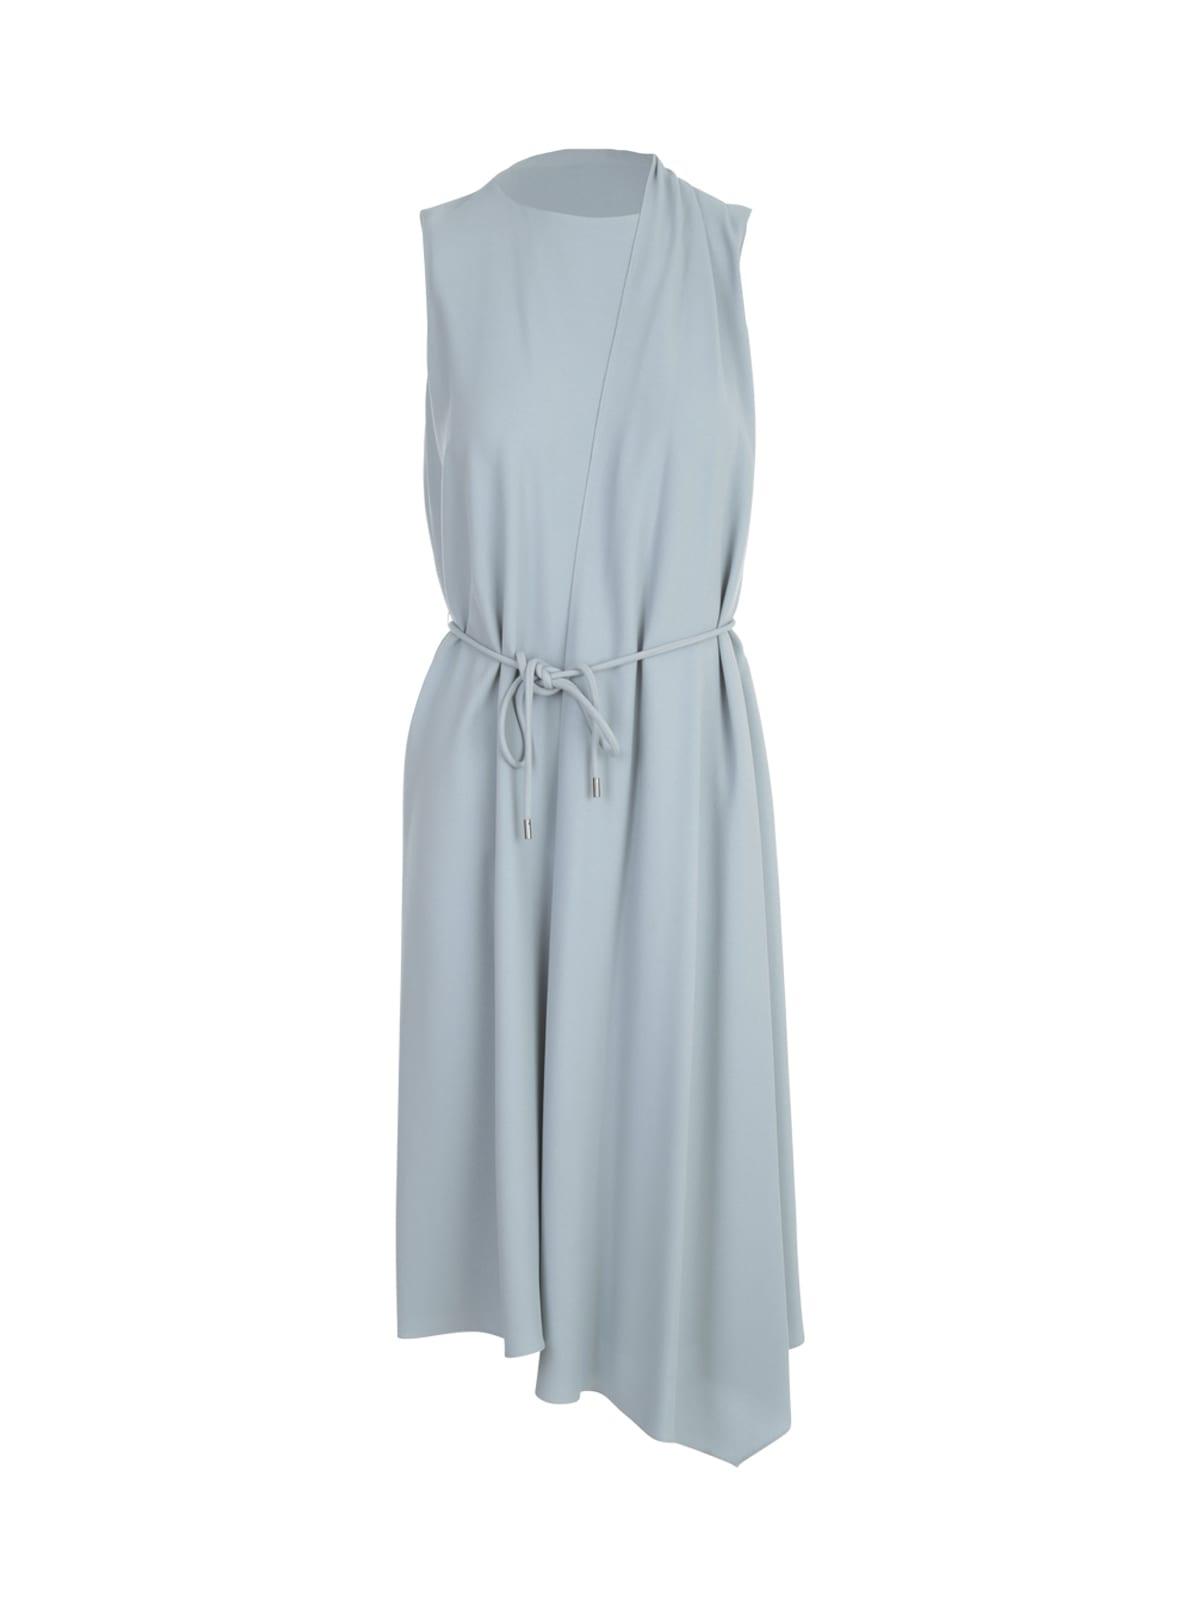 Theory Drape Tie Sleeveless Dress